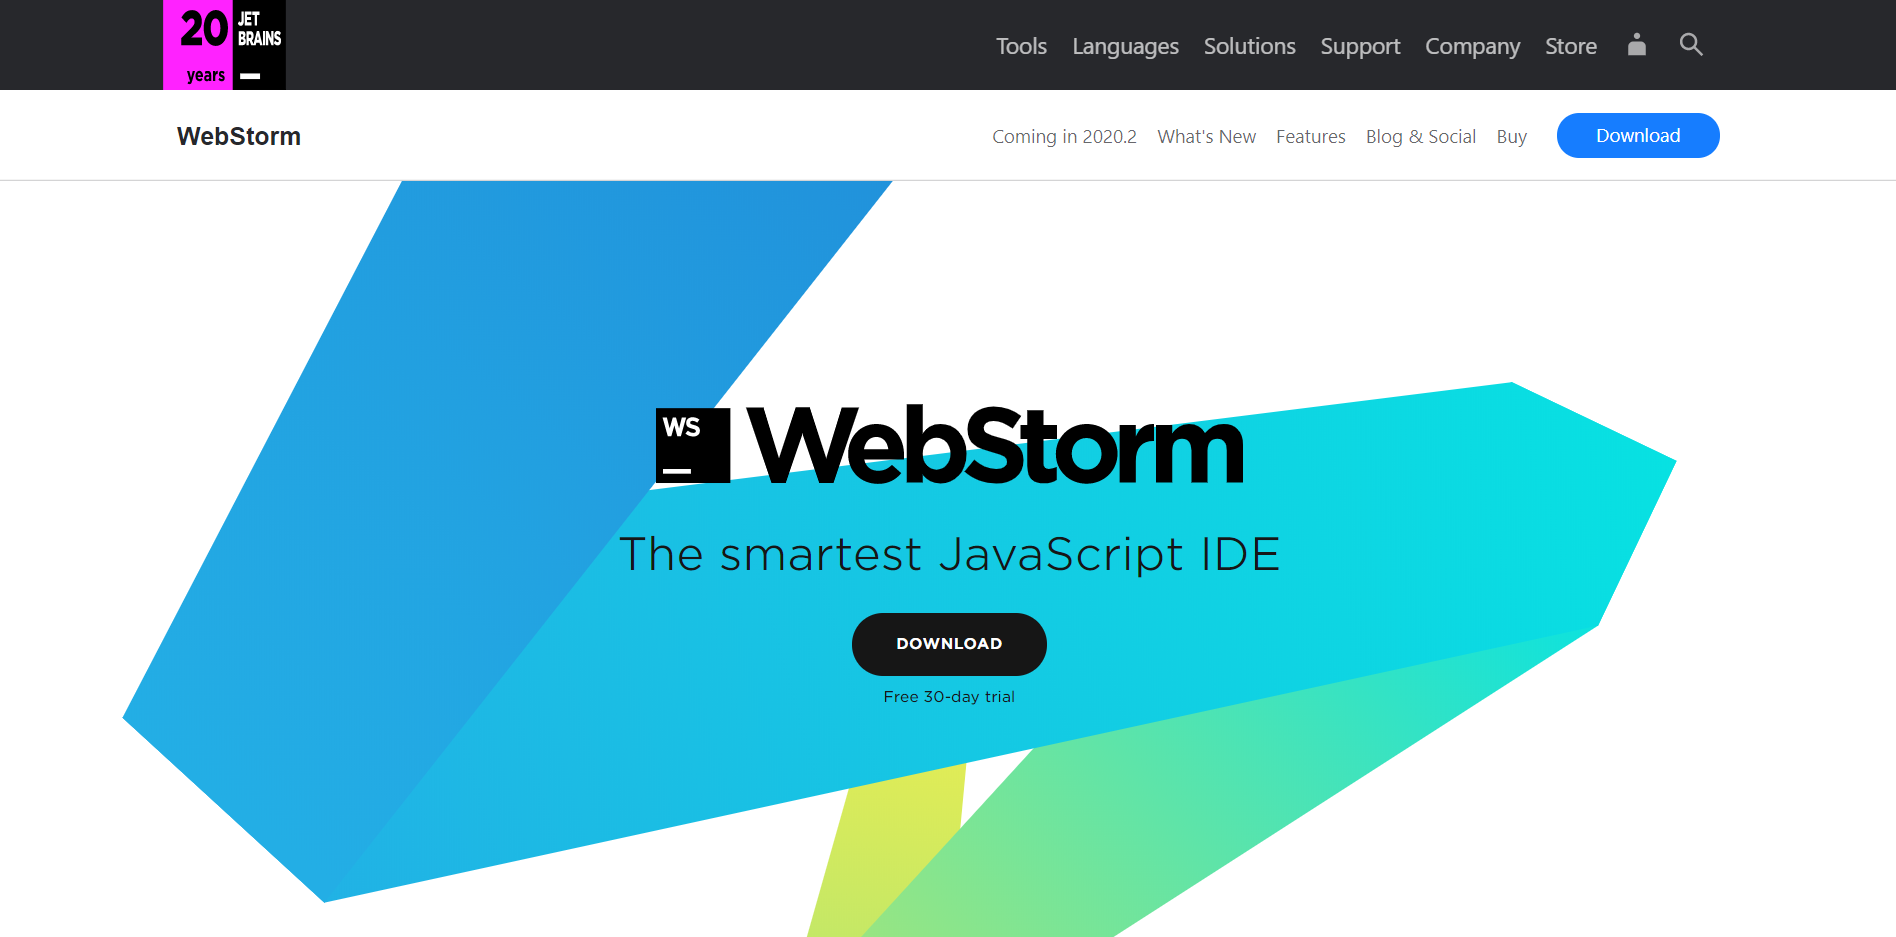 WebStorm landing page